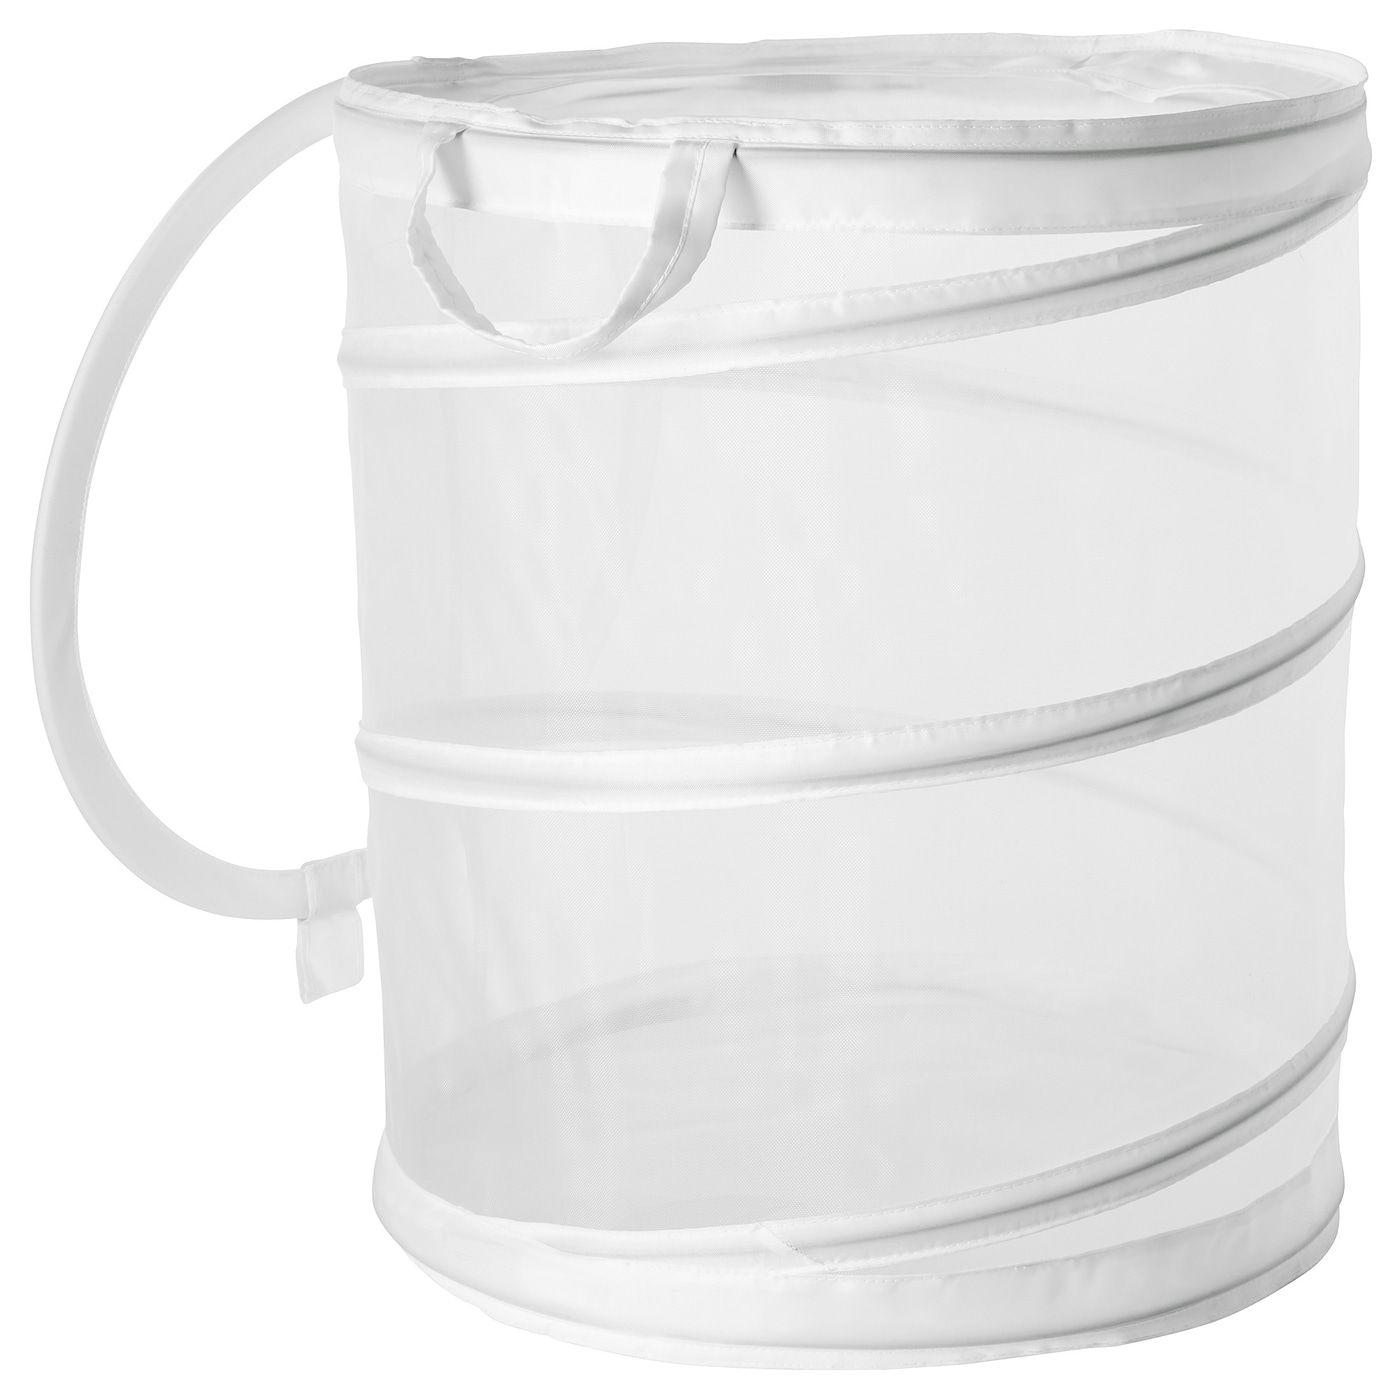 Fyllen Laundry Basket White 21 Gallon With Images Ikea